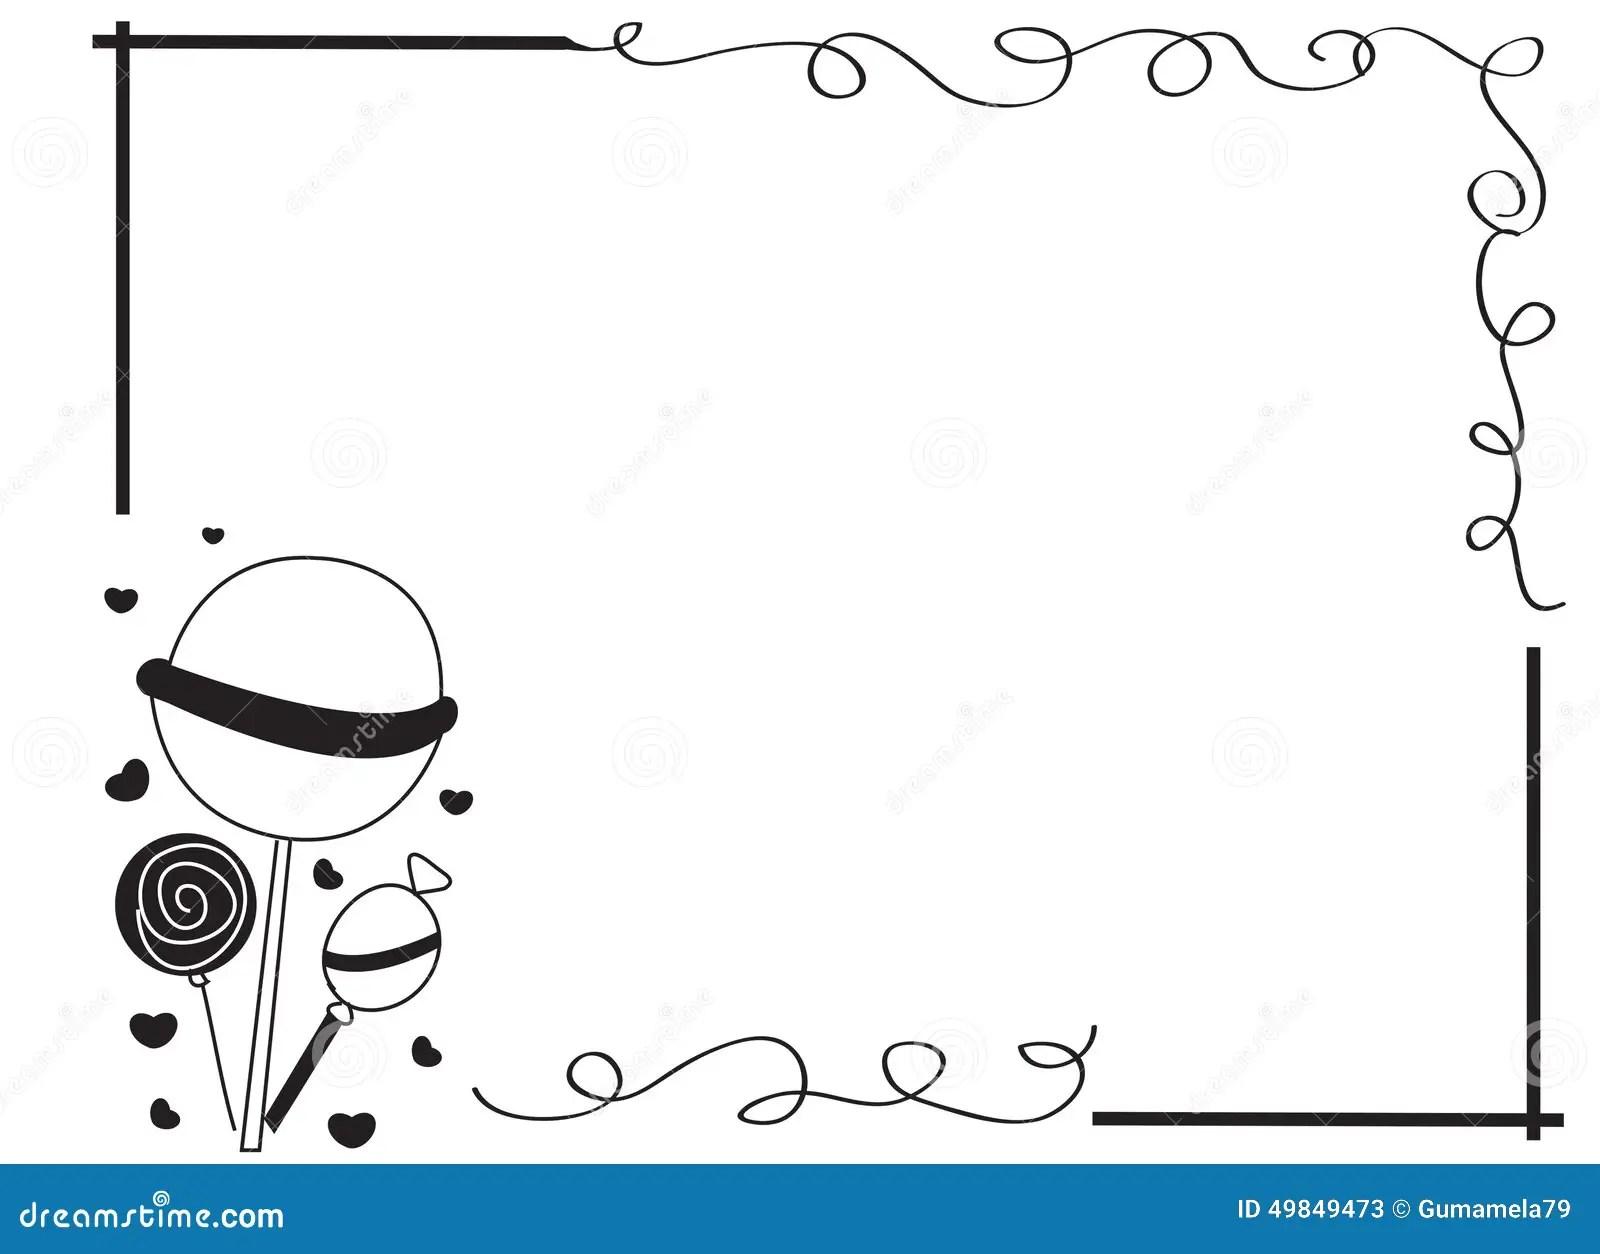 Decorative Frame Border With Lollipops Stock Illustration